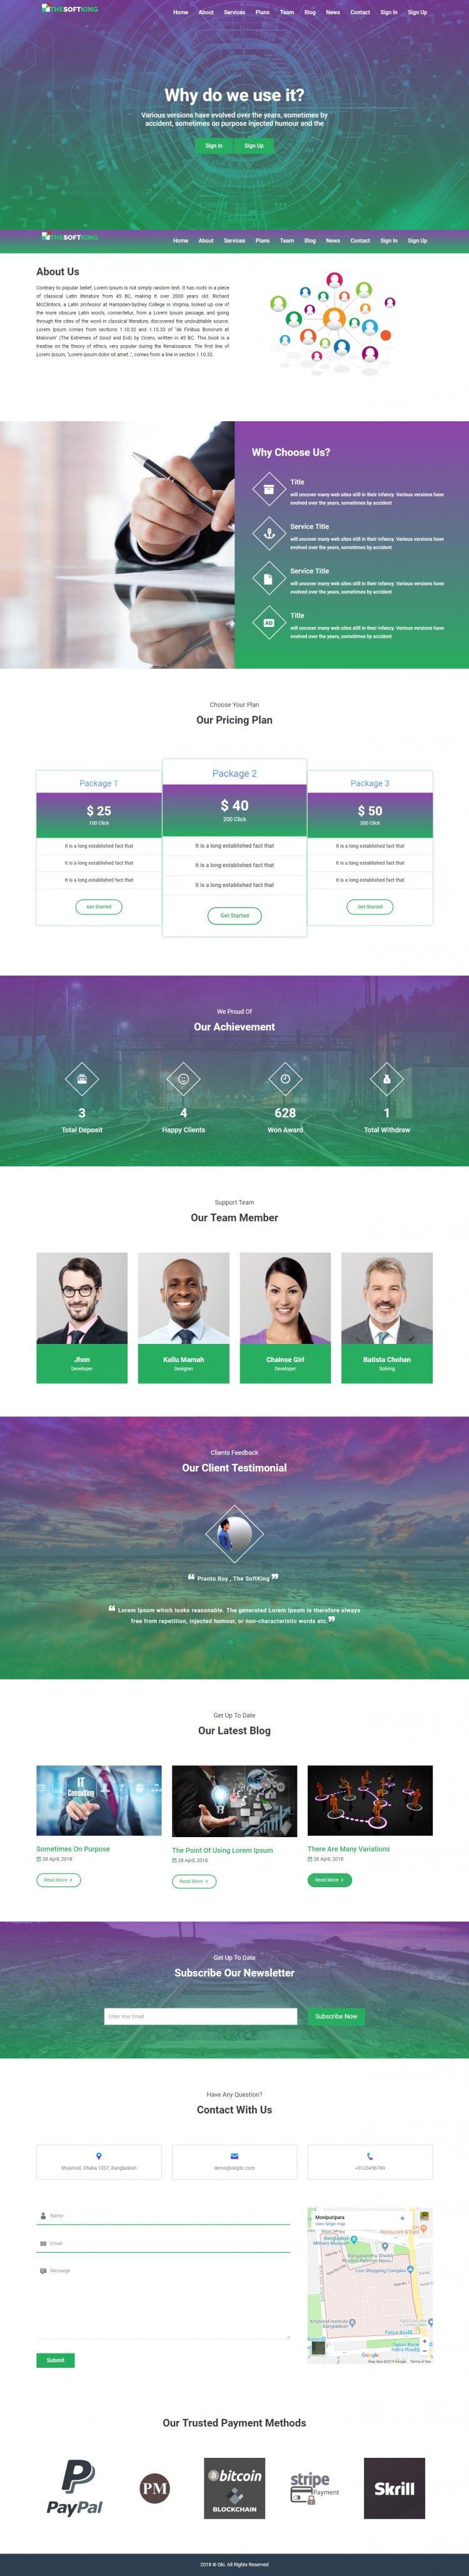 Oki - Pay Per Click Platform Nulled